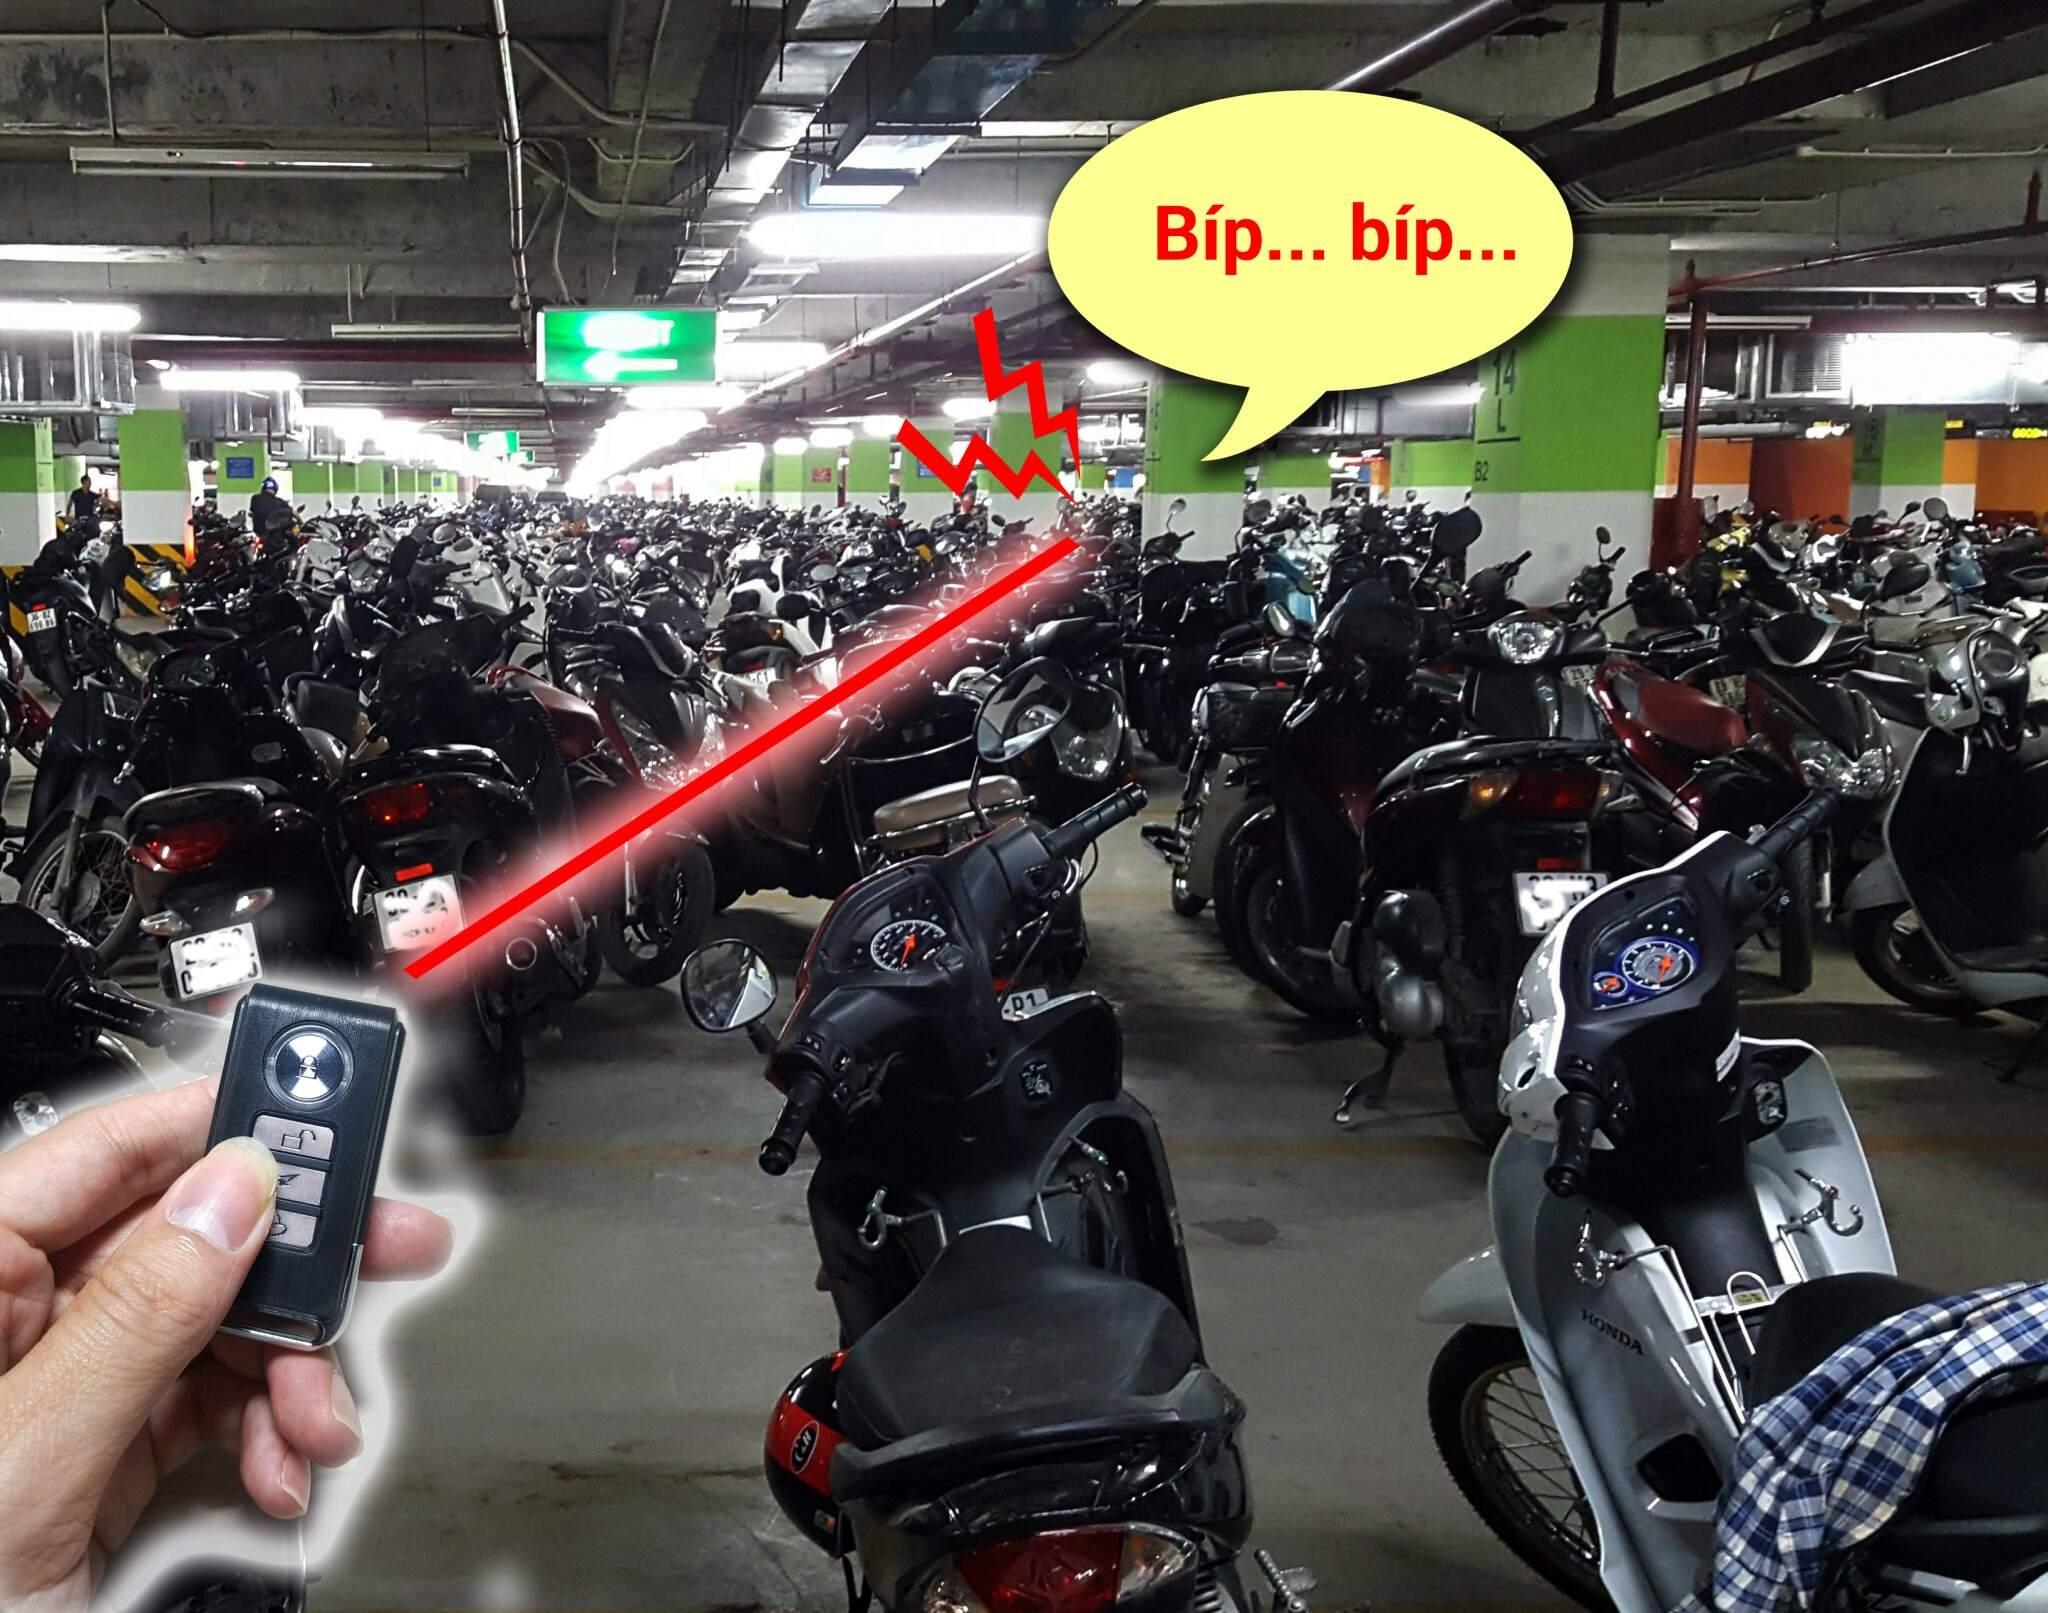 bo-tim-xe-may-thong-minh-6